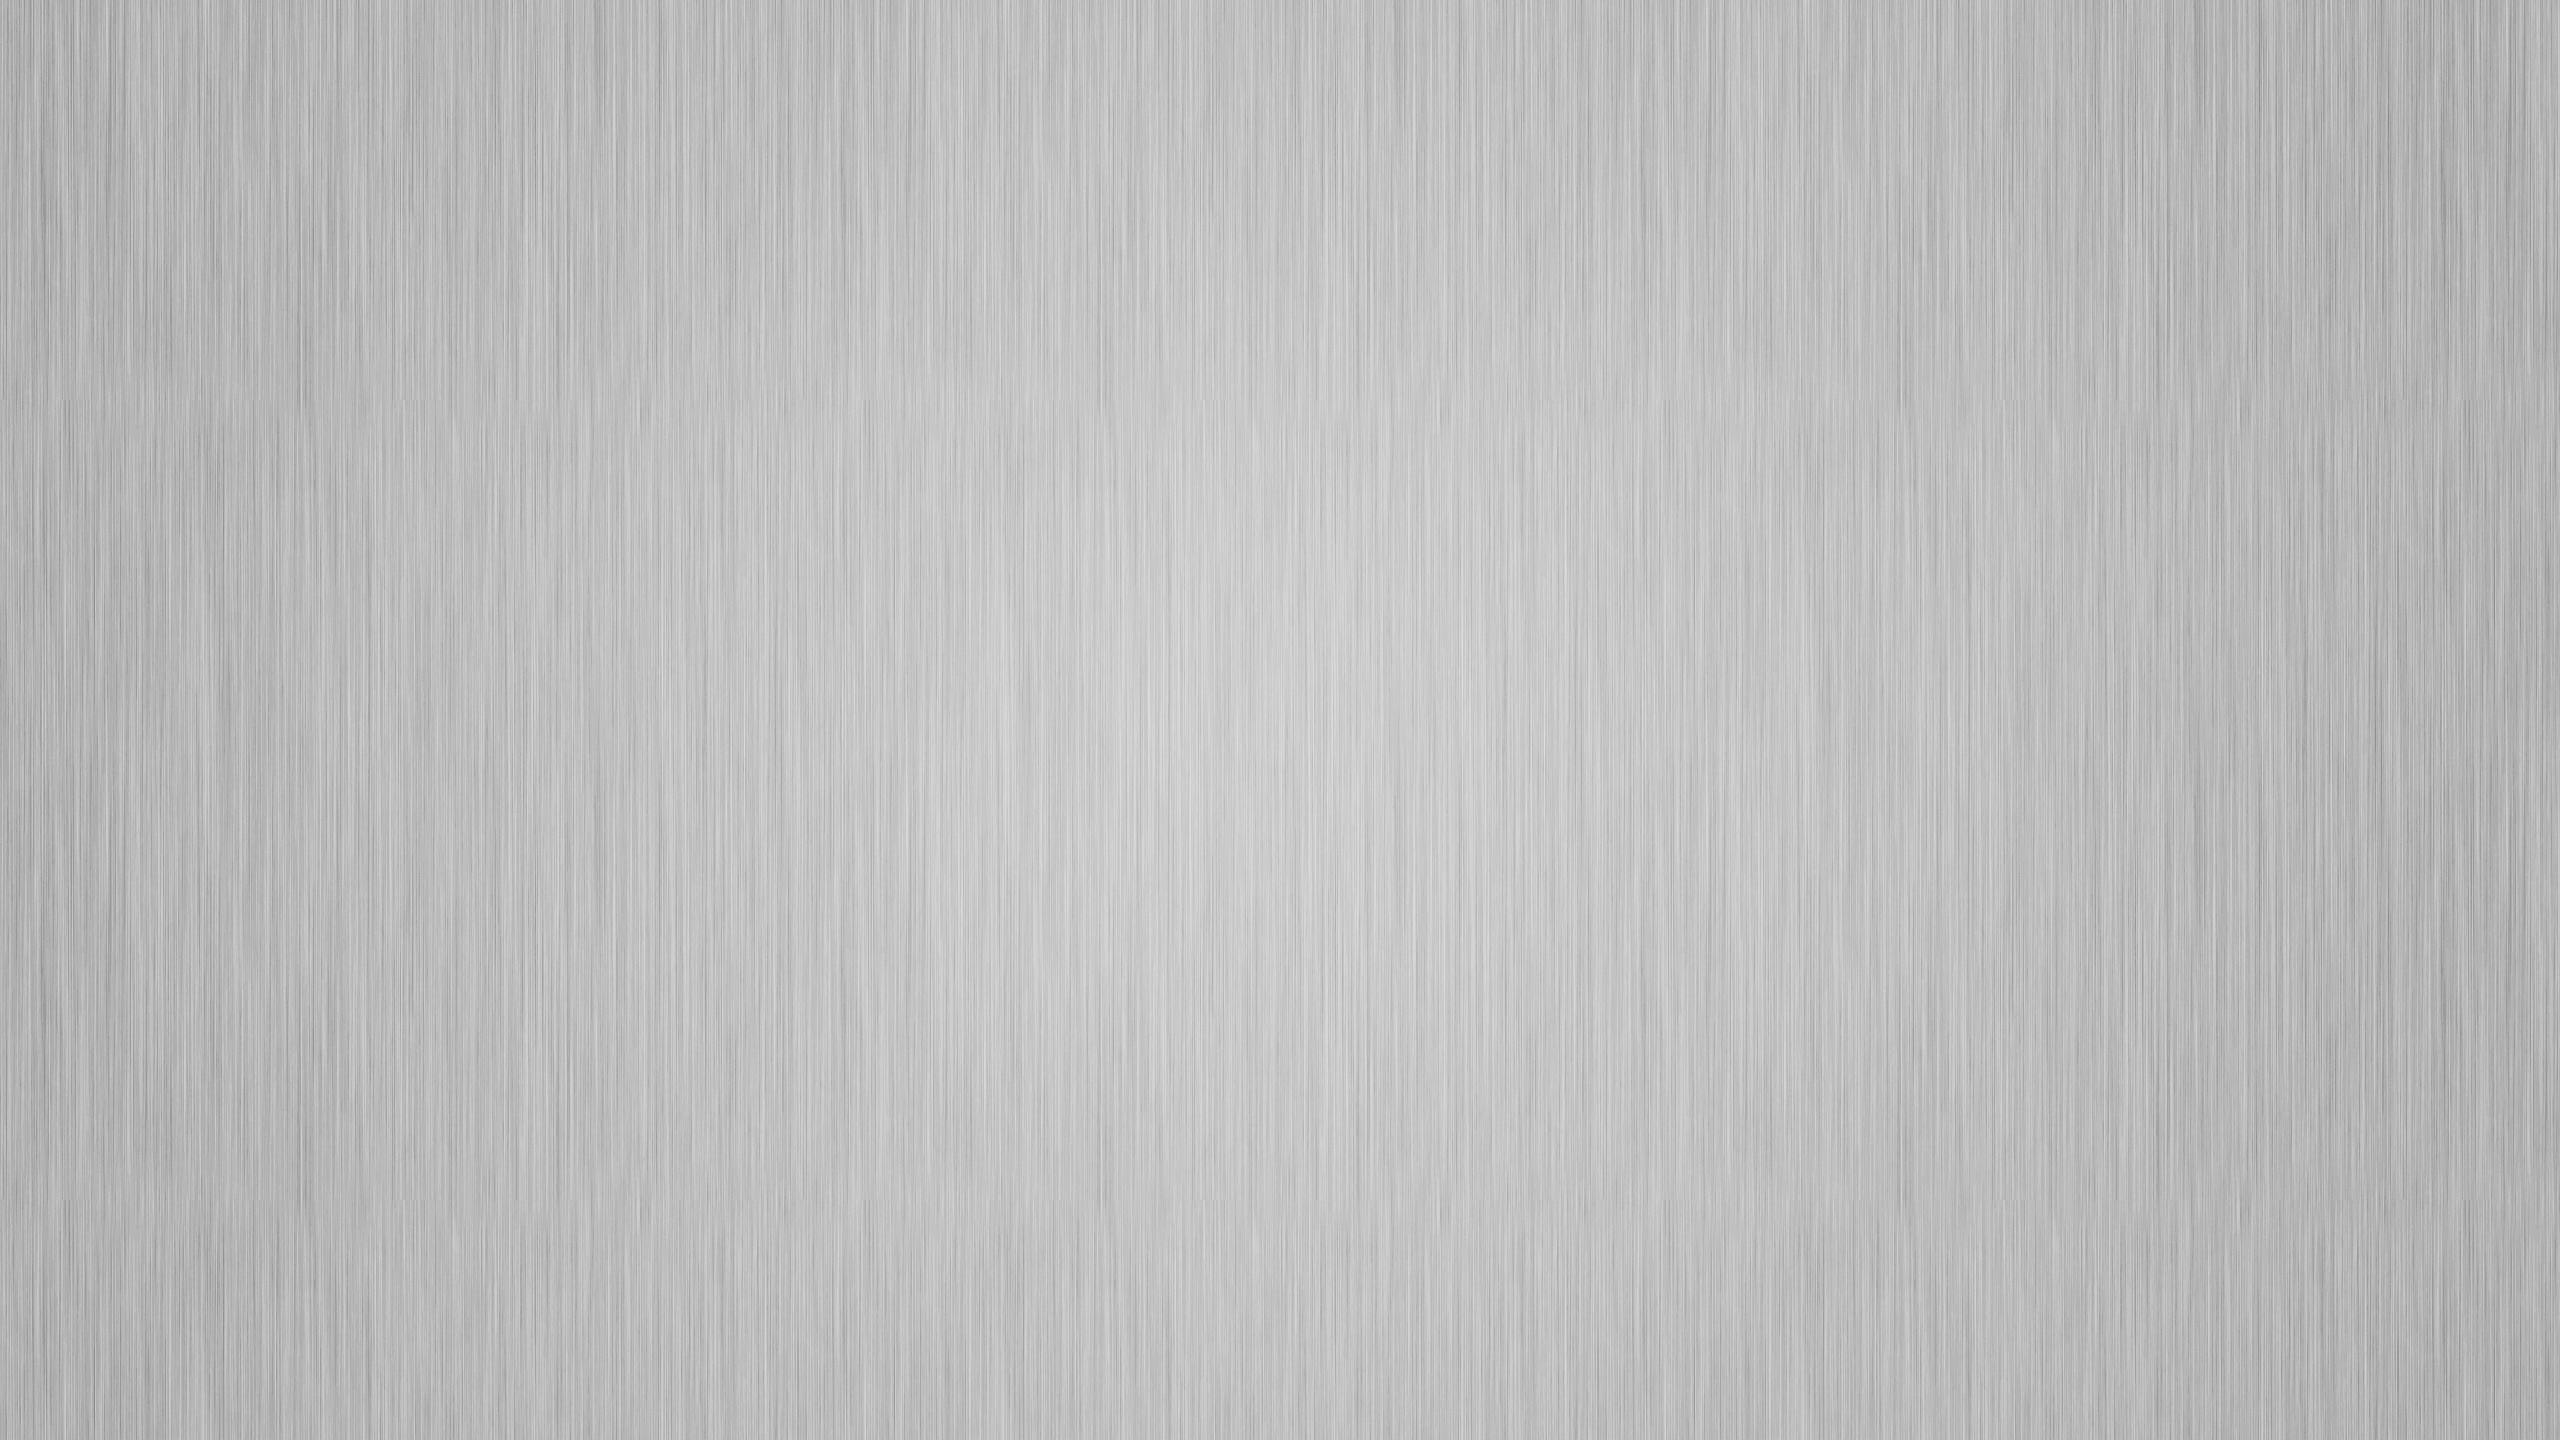 White Gray Textured Wallpaper